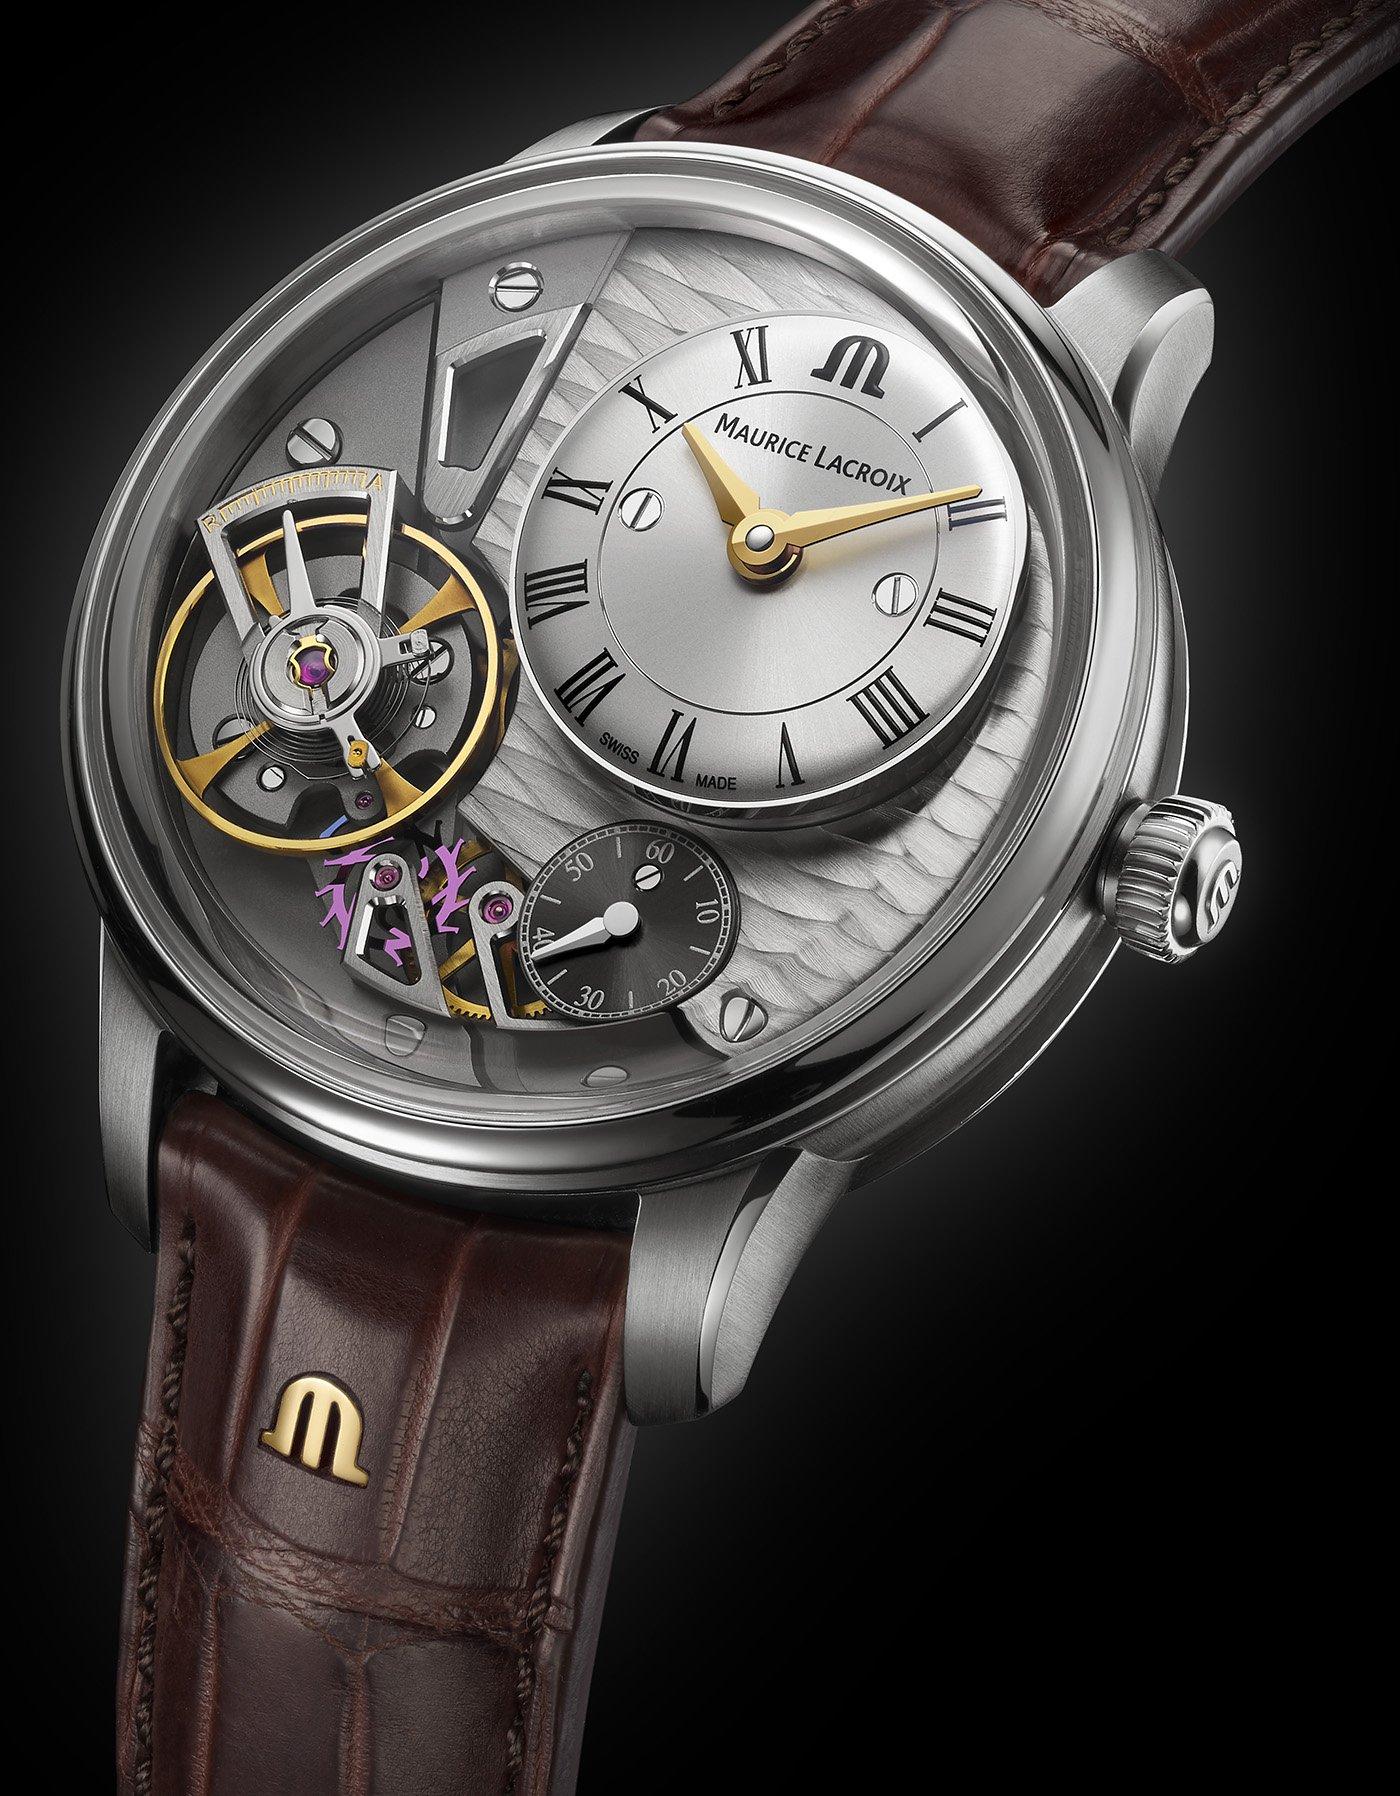 Maurice Lacroix анонсирует обновленные часы Masterpiece Gravity Watch